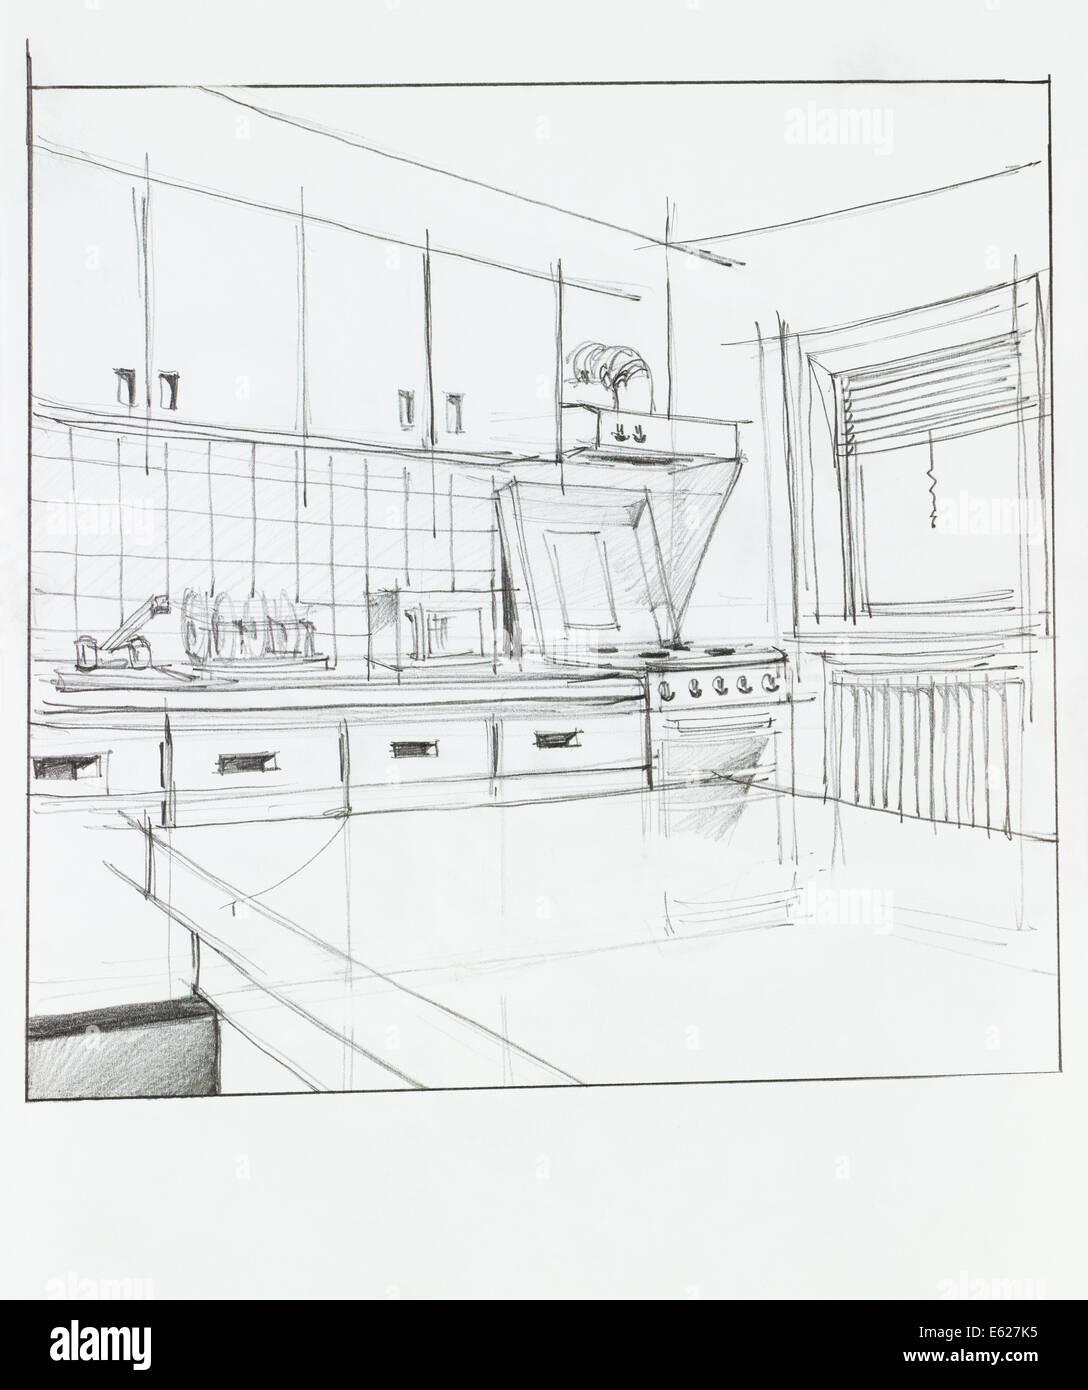 Interior hand drawn perspective of kitchen